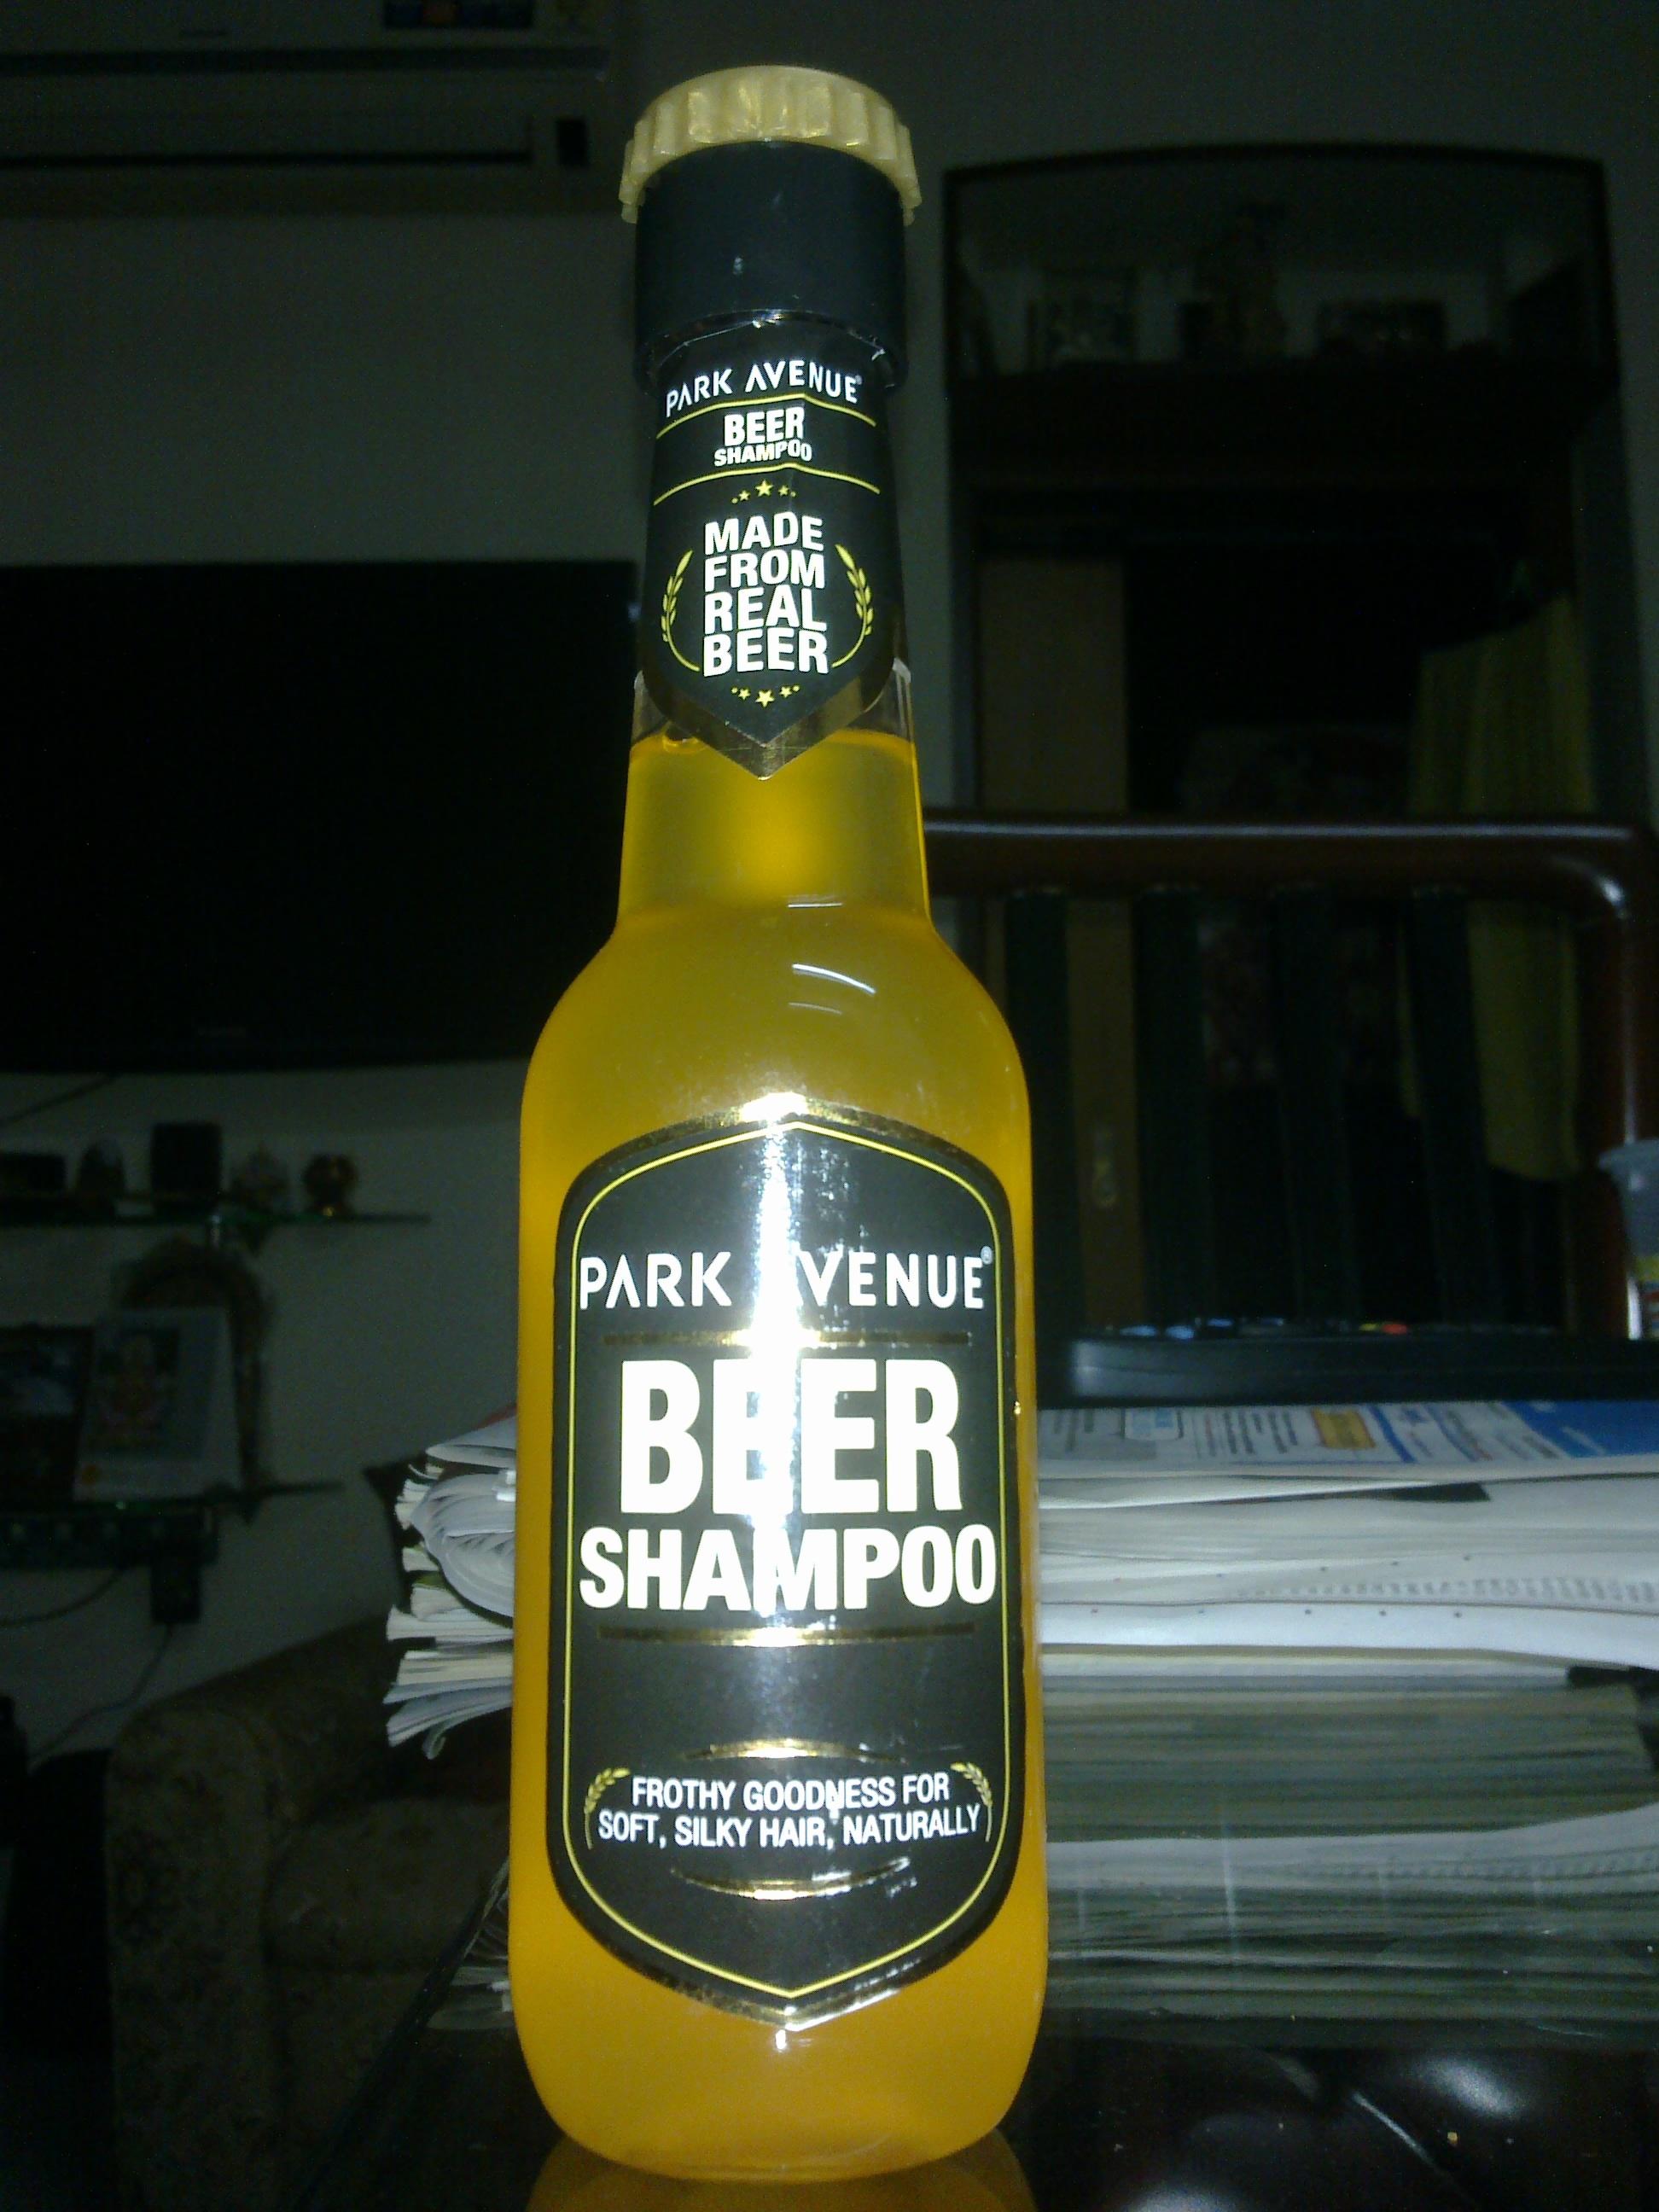 Park Avenue Beer Shampoo